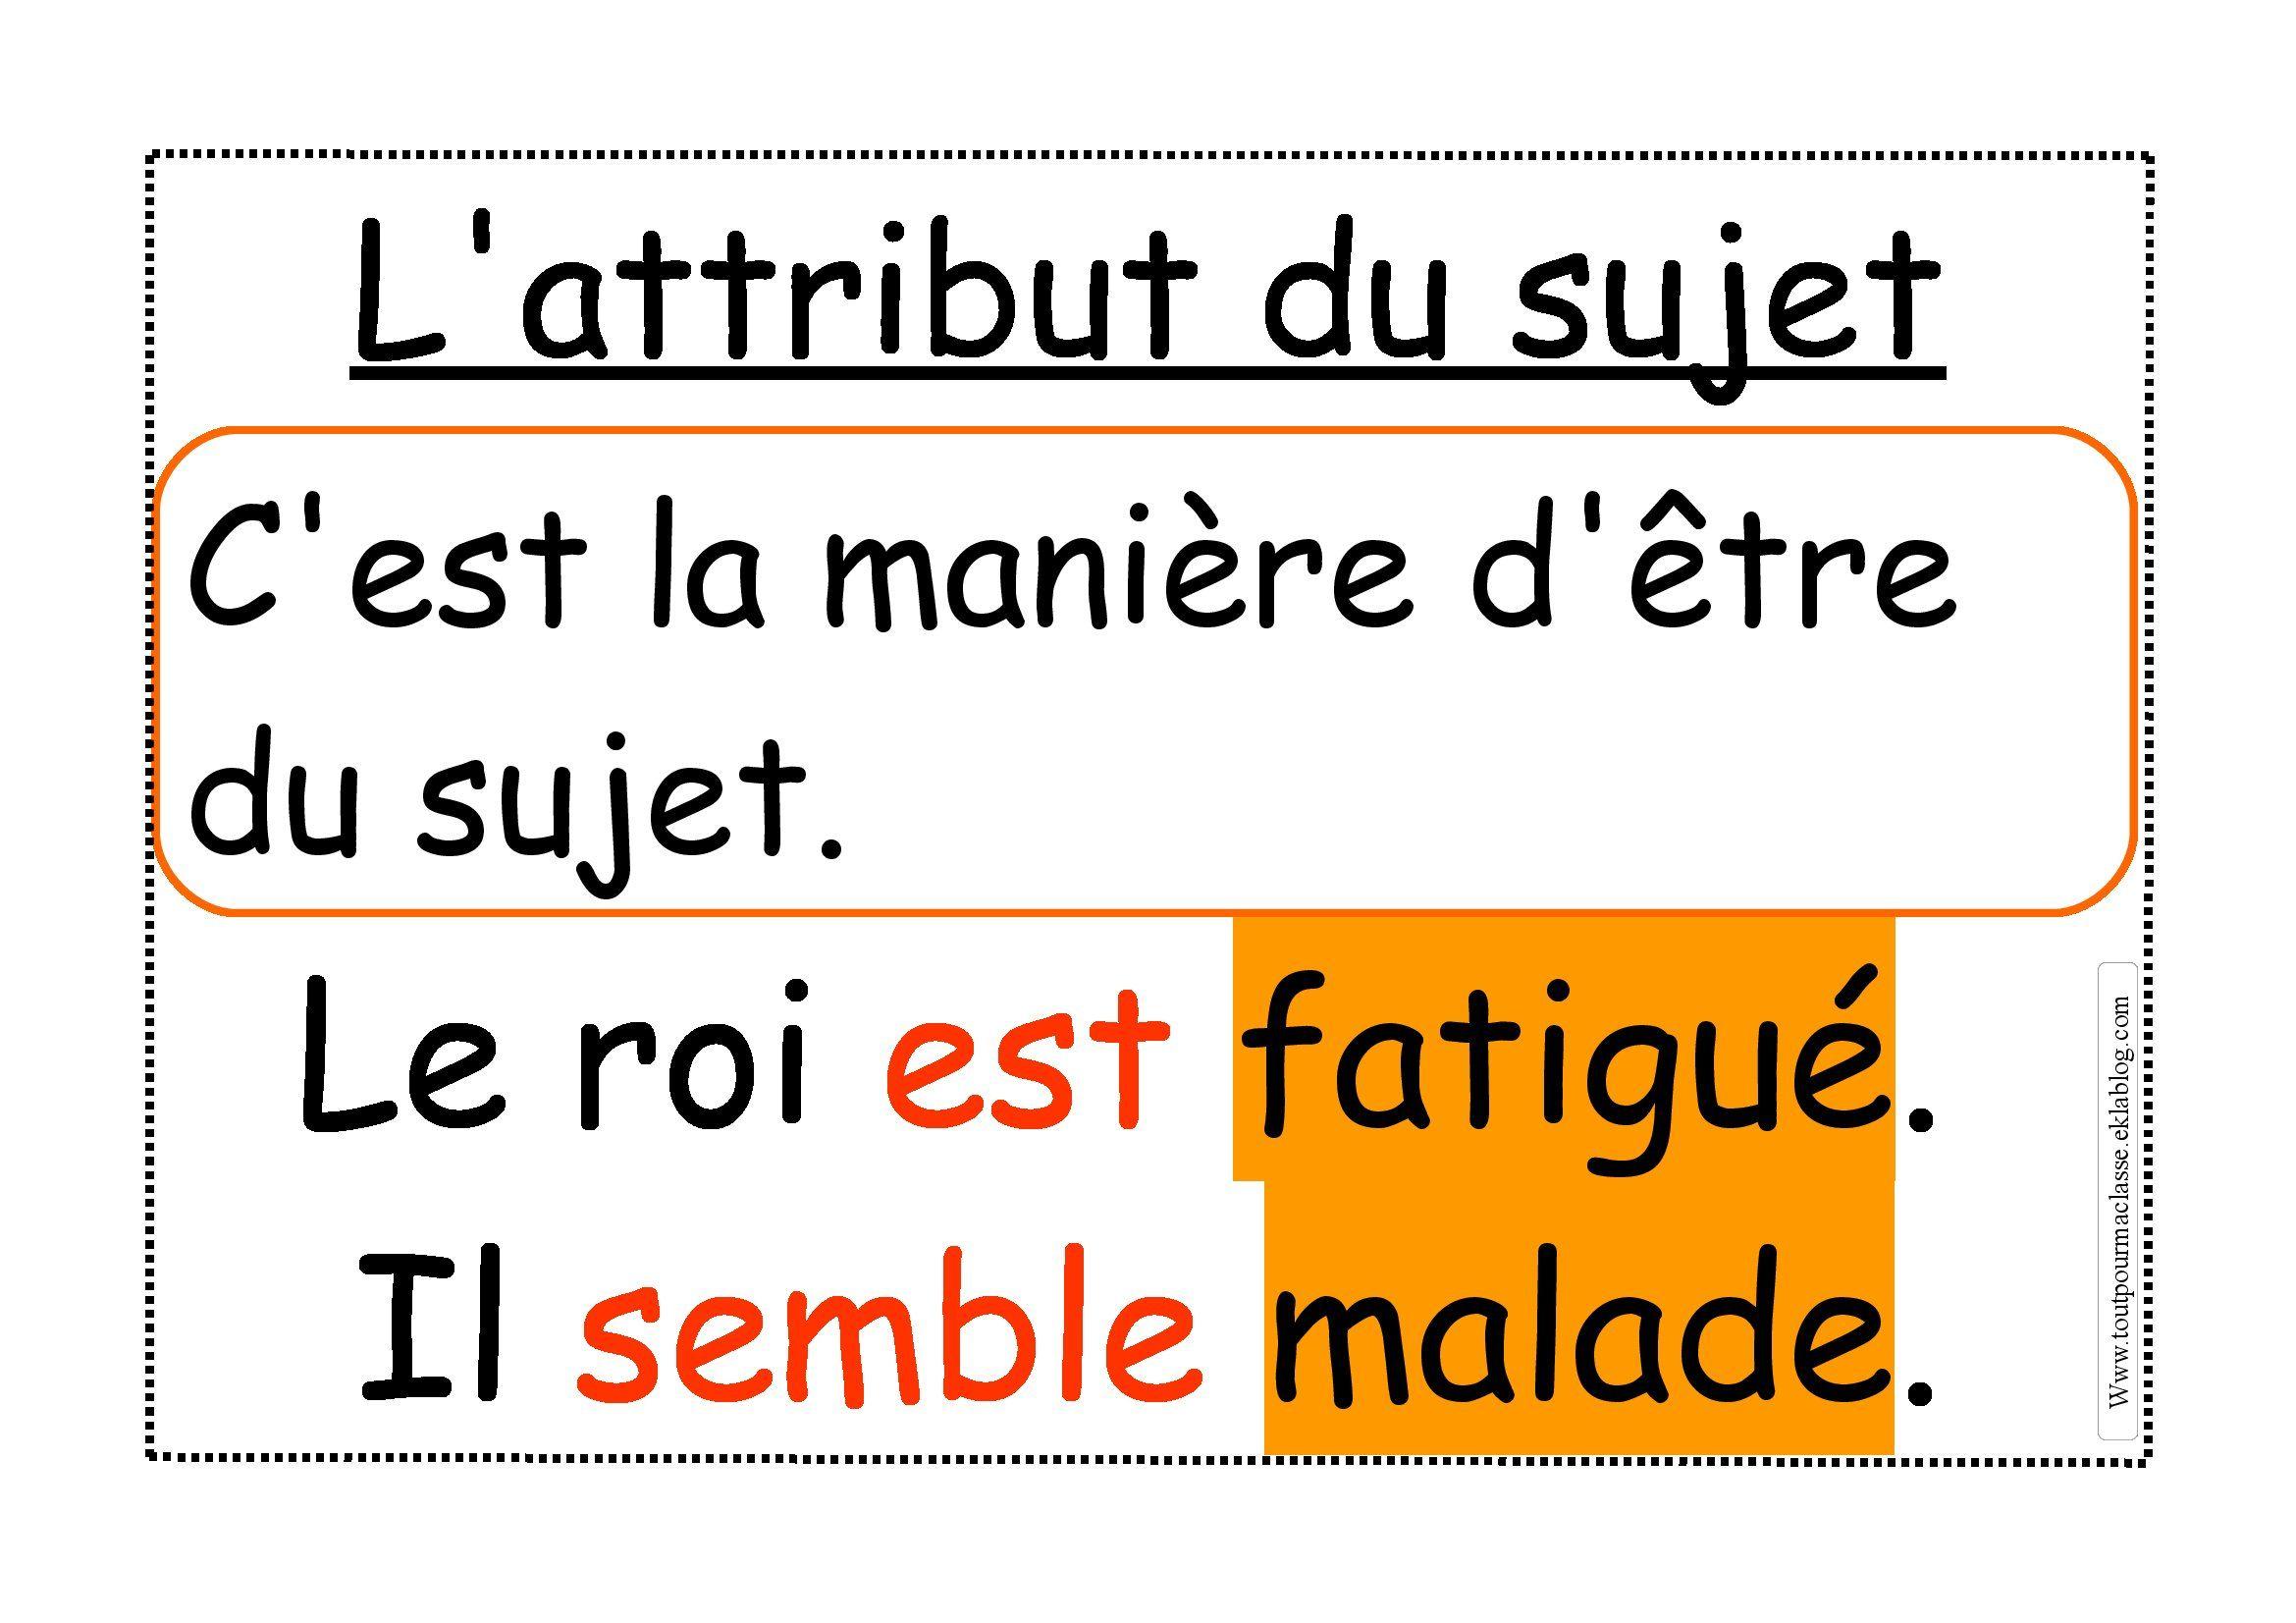 Traduction En Anglais Car Je Suis Malade - CARCROT